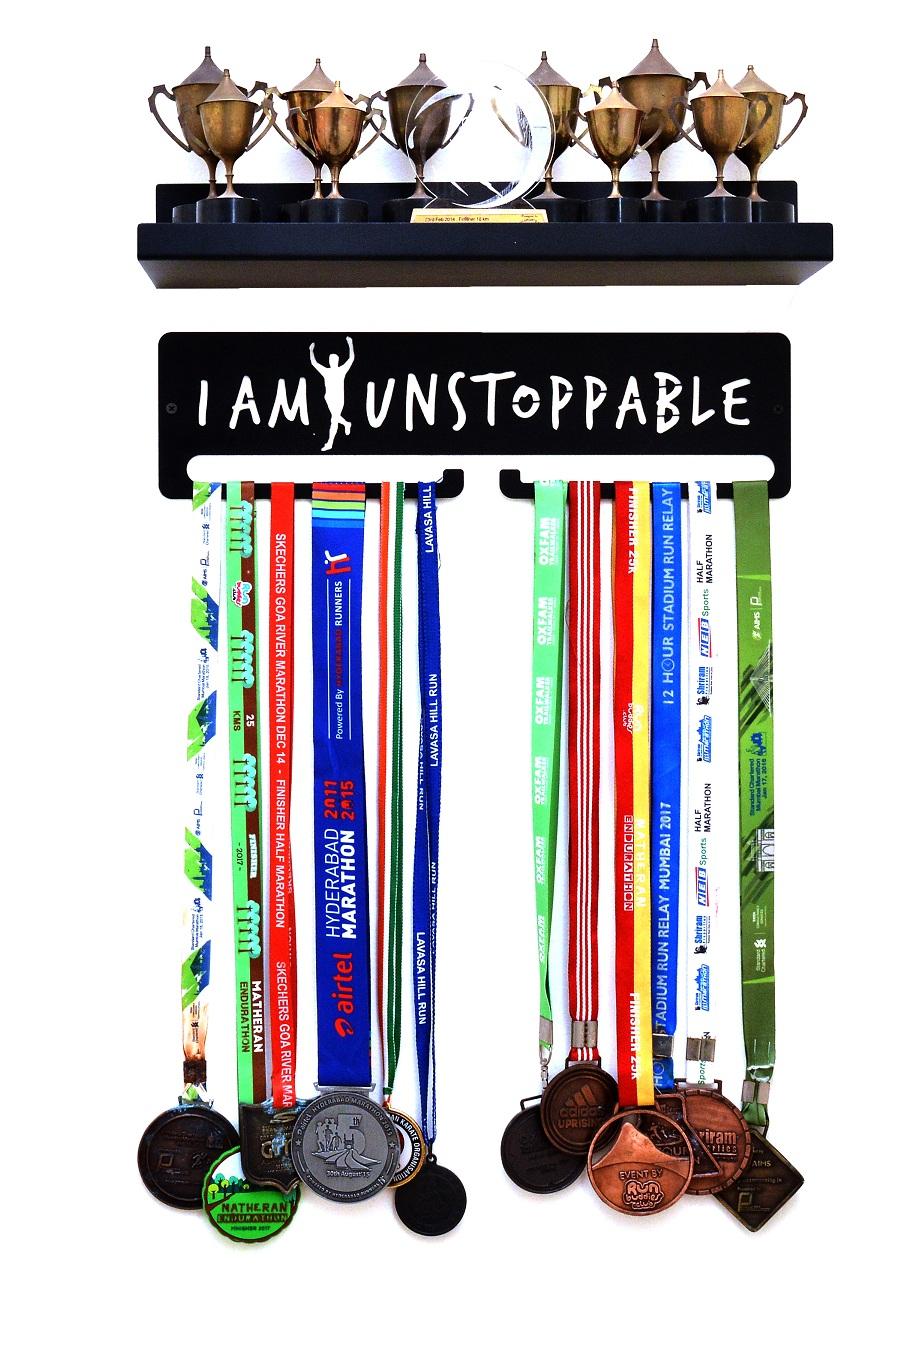 I am Unstopable (3)